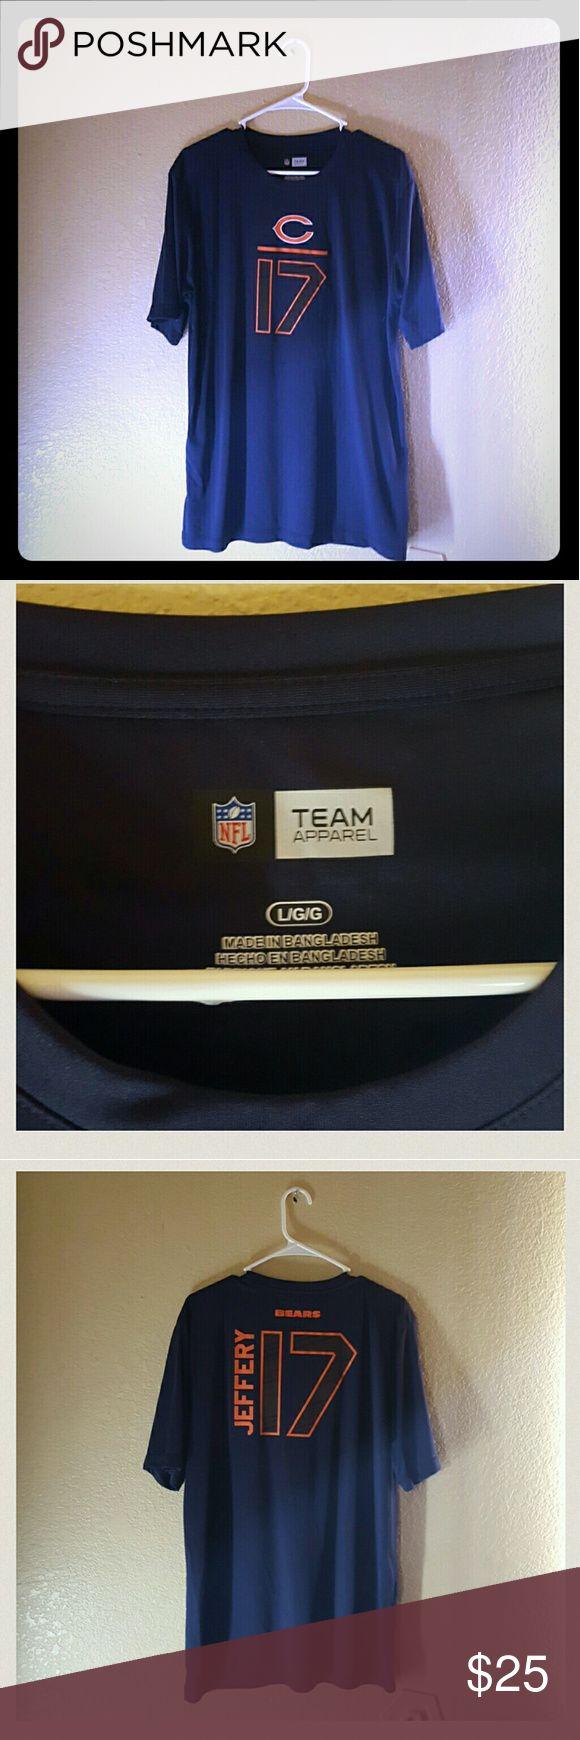 Chicago Bears NFL Team Apparel Tee Great Condition NFL Team Apparel Chicago Bears Tee With No Damages!!! NFL Team Apparel Shirts Tees - Short Sleeve